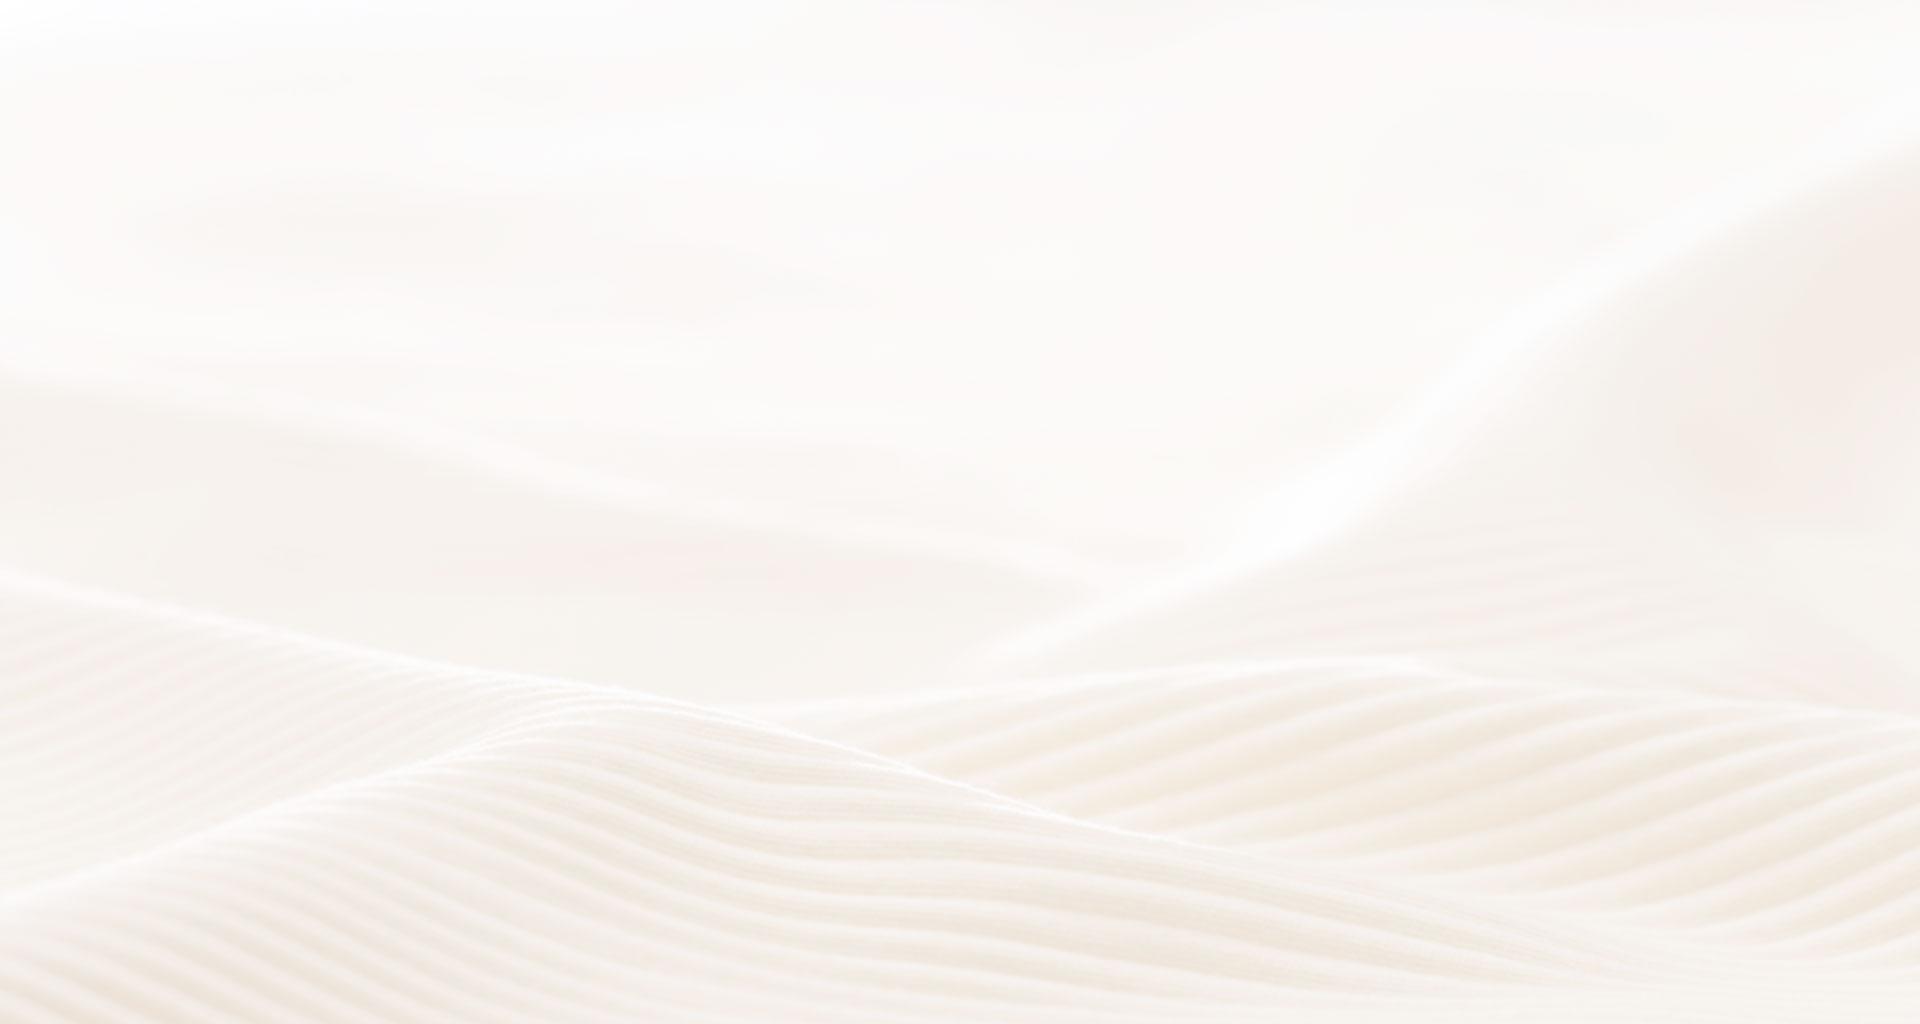 Sheets-bedding-visiting-background